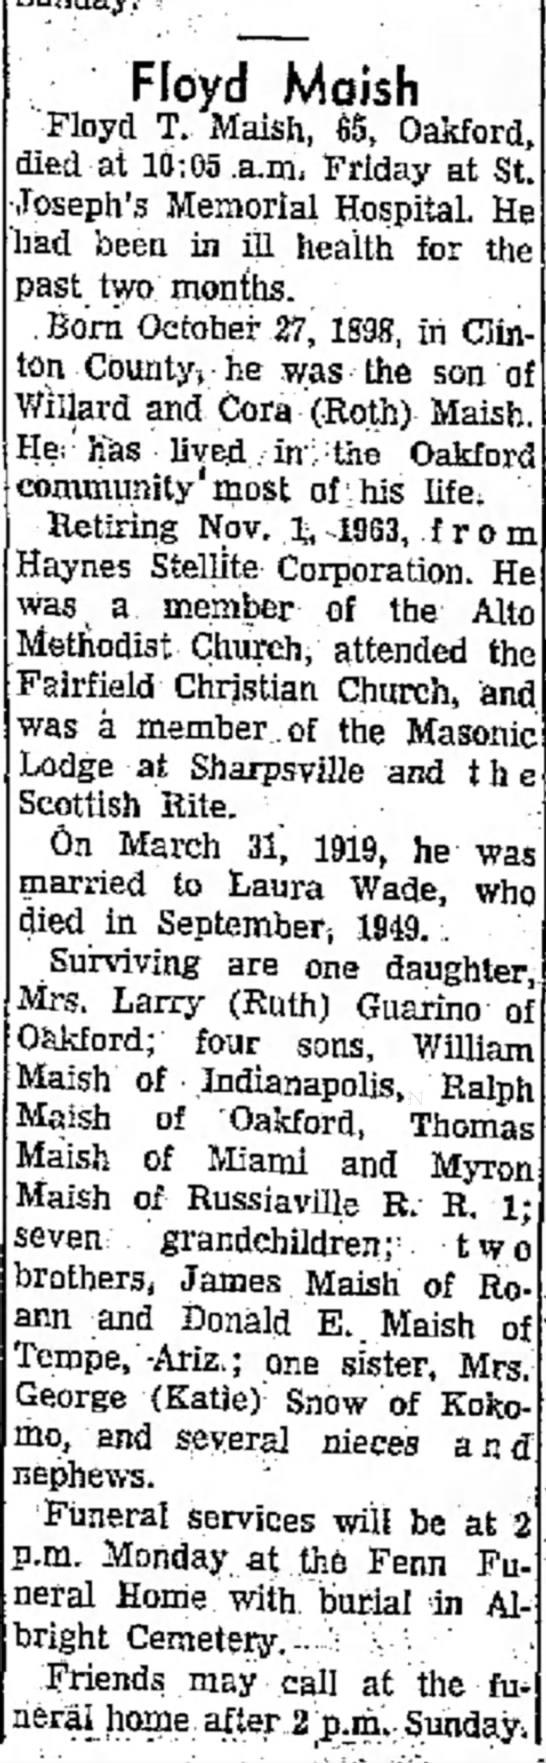 Maish Floyd 1964 Feb 28 Obituar -